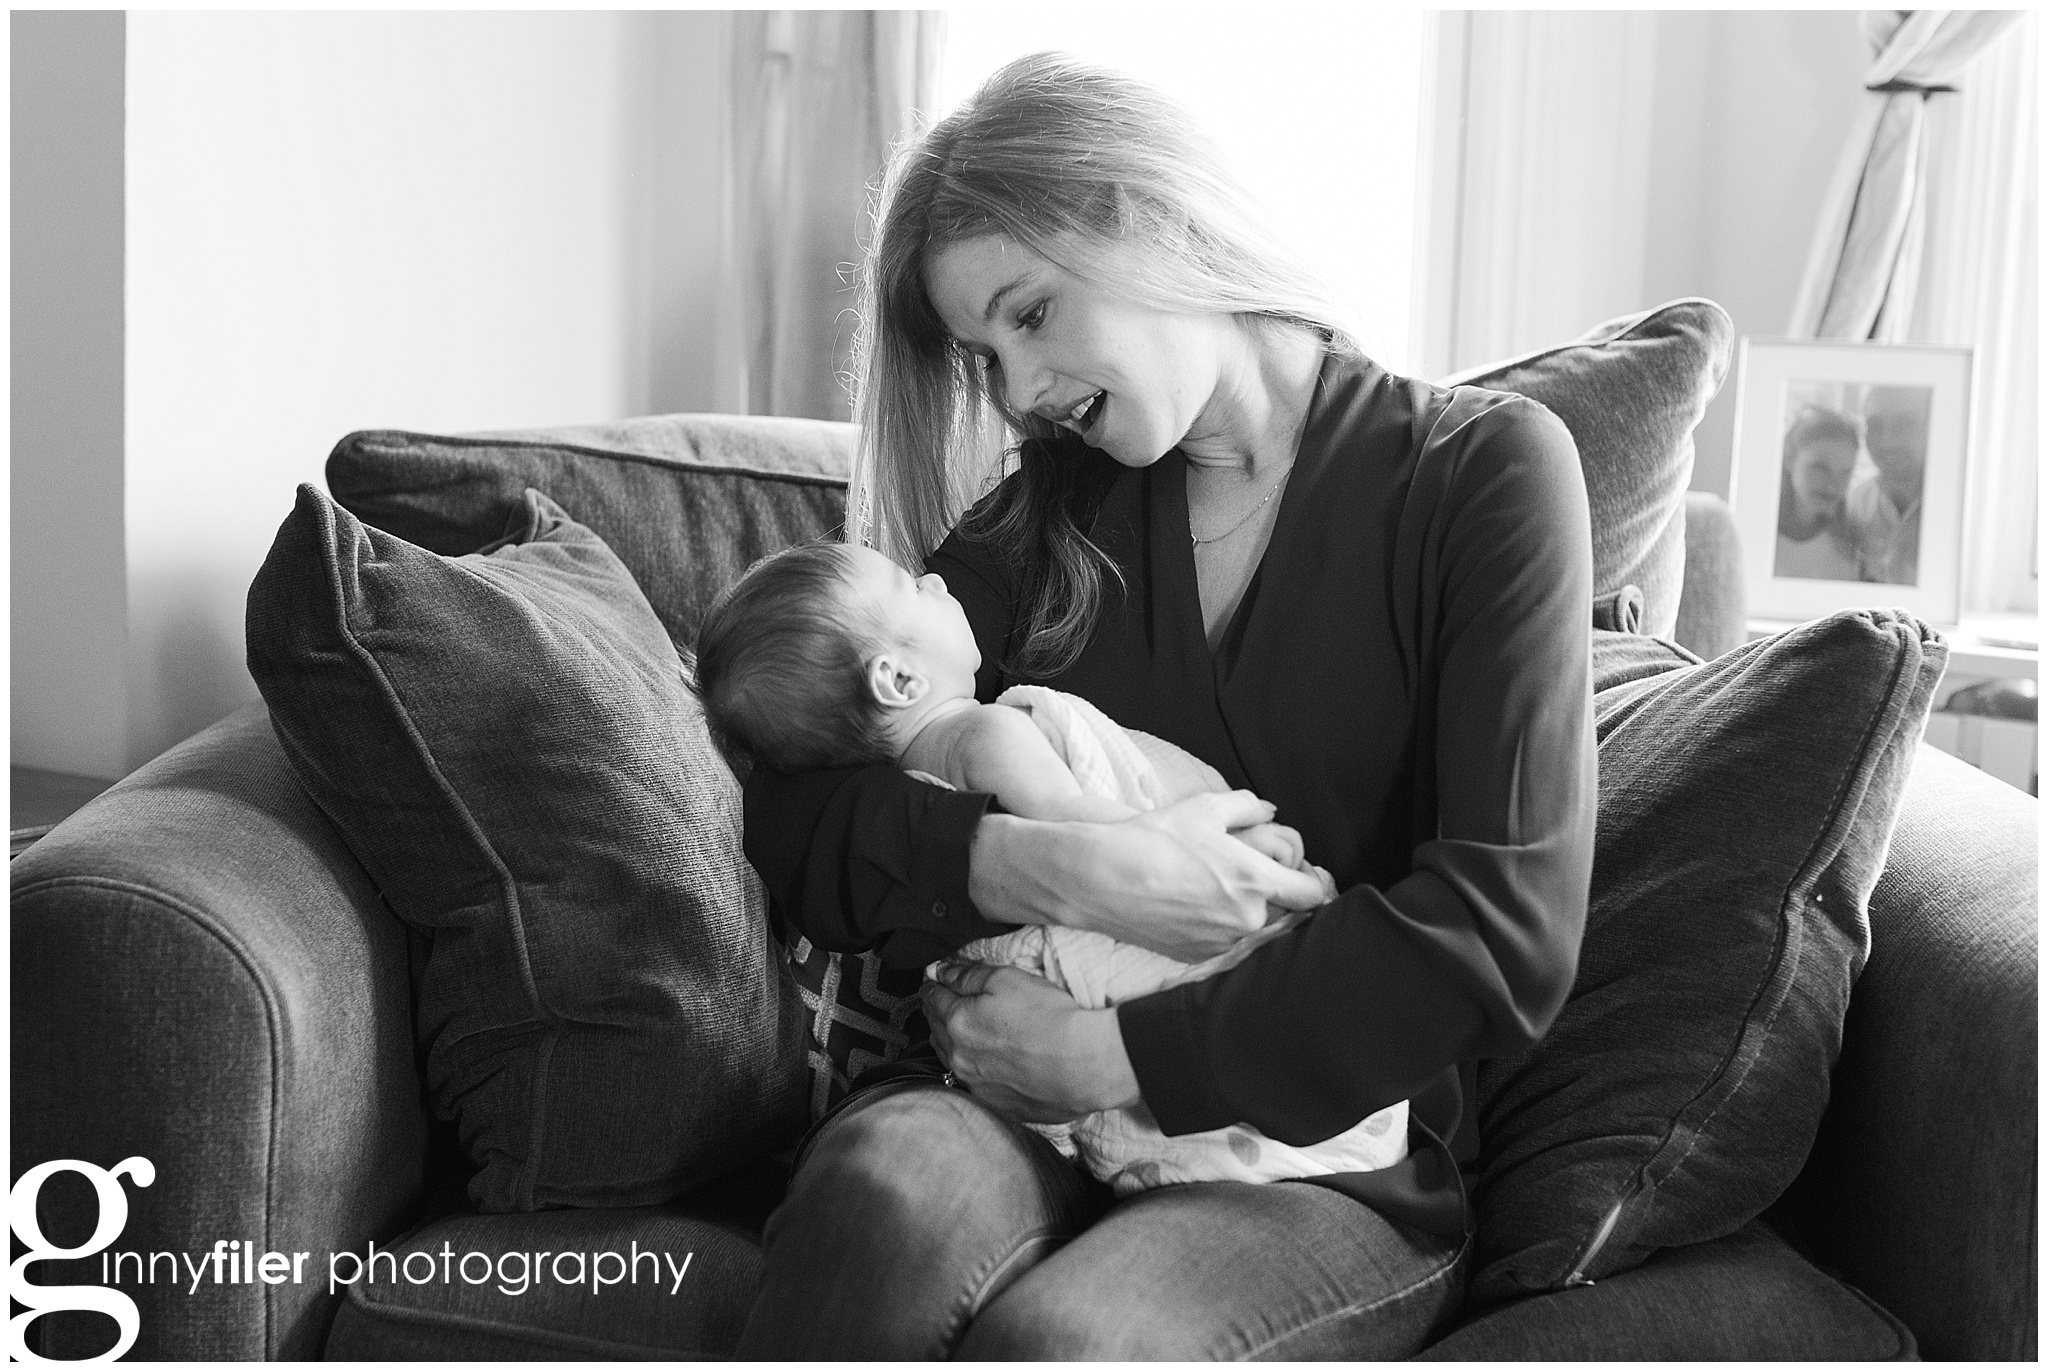 newborn_photography_Cullen_0005.jpg